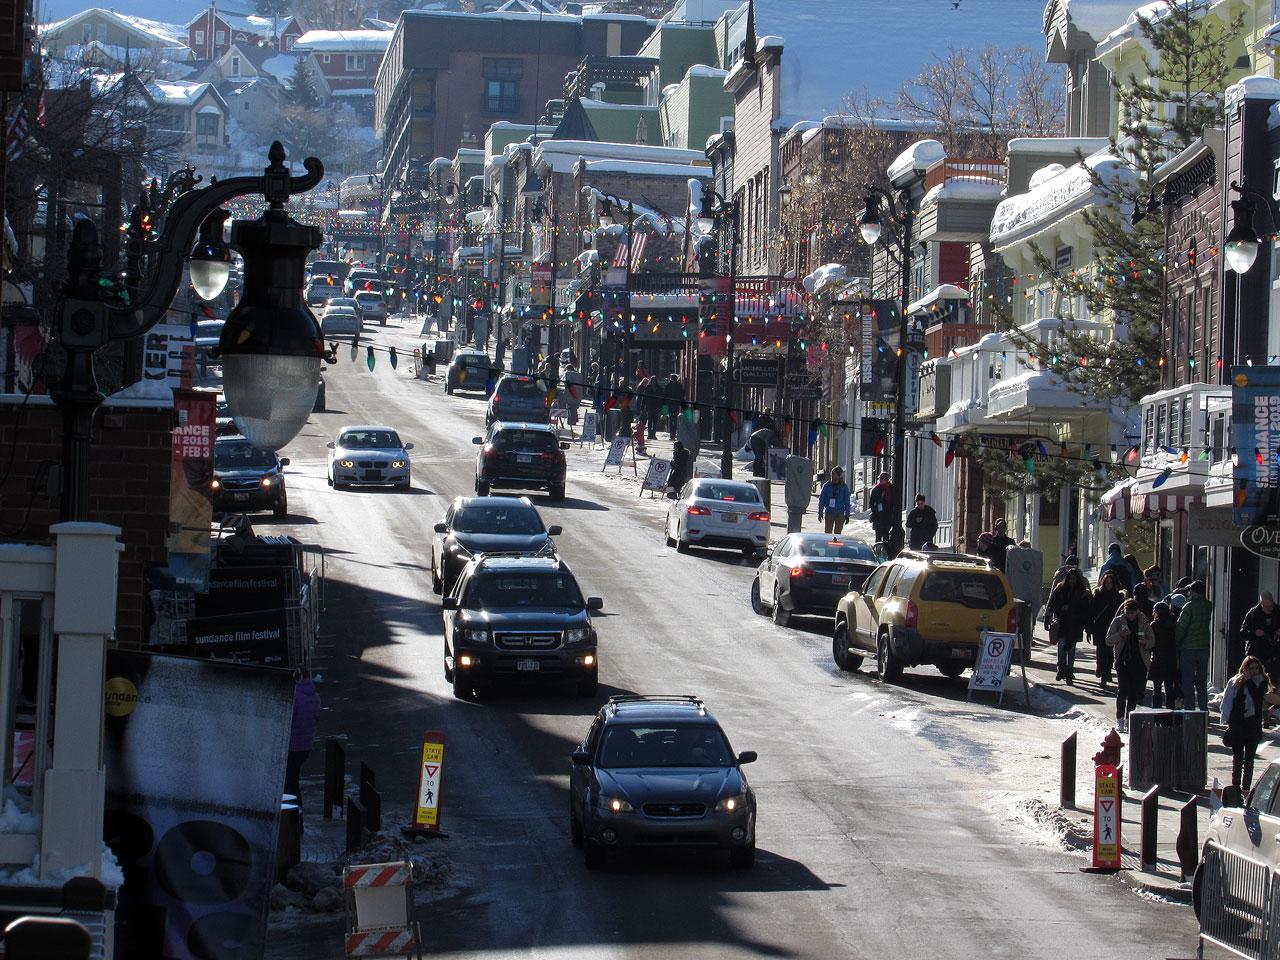 Sundance traffic in Park City